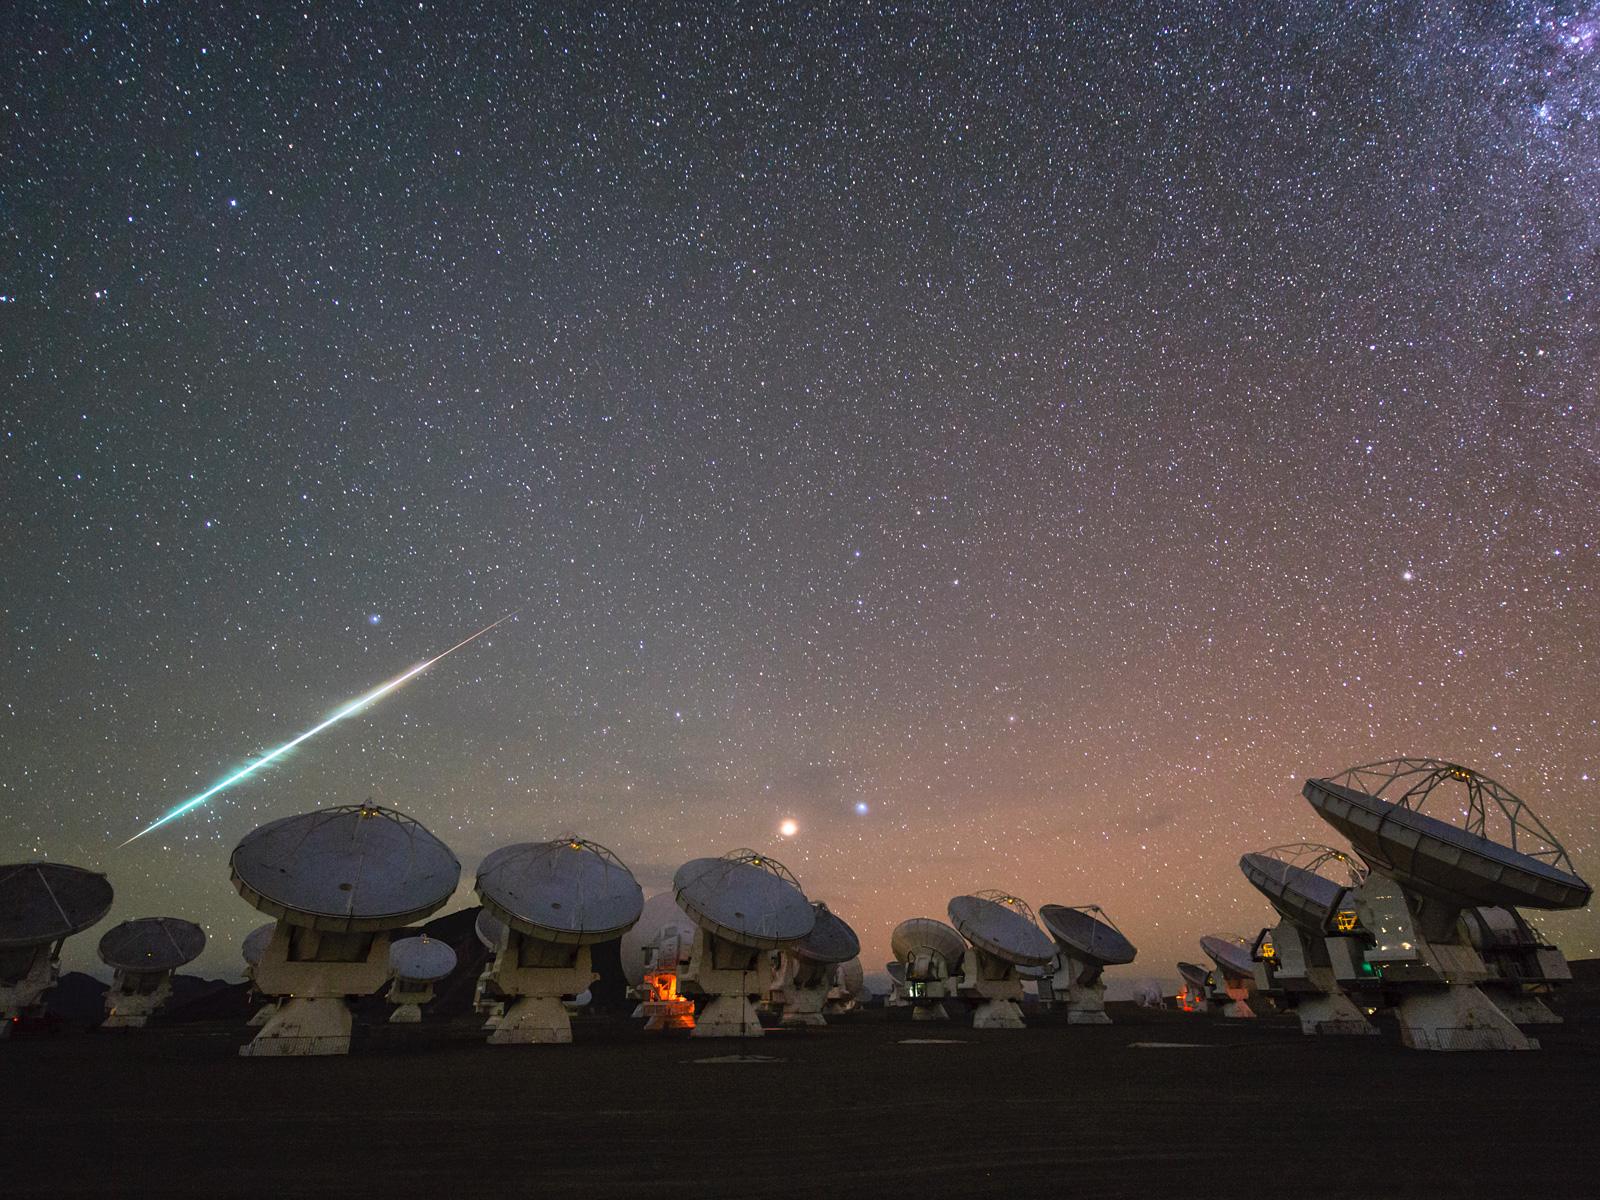 Fiery Voyage Over ALMA | Space Wallpaper